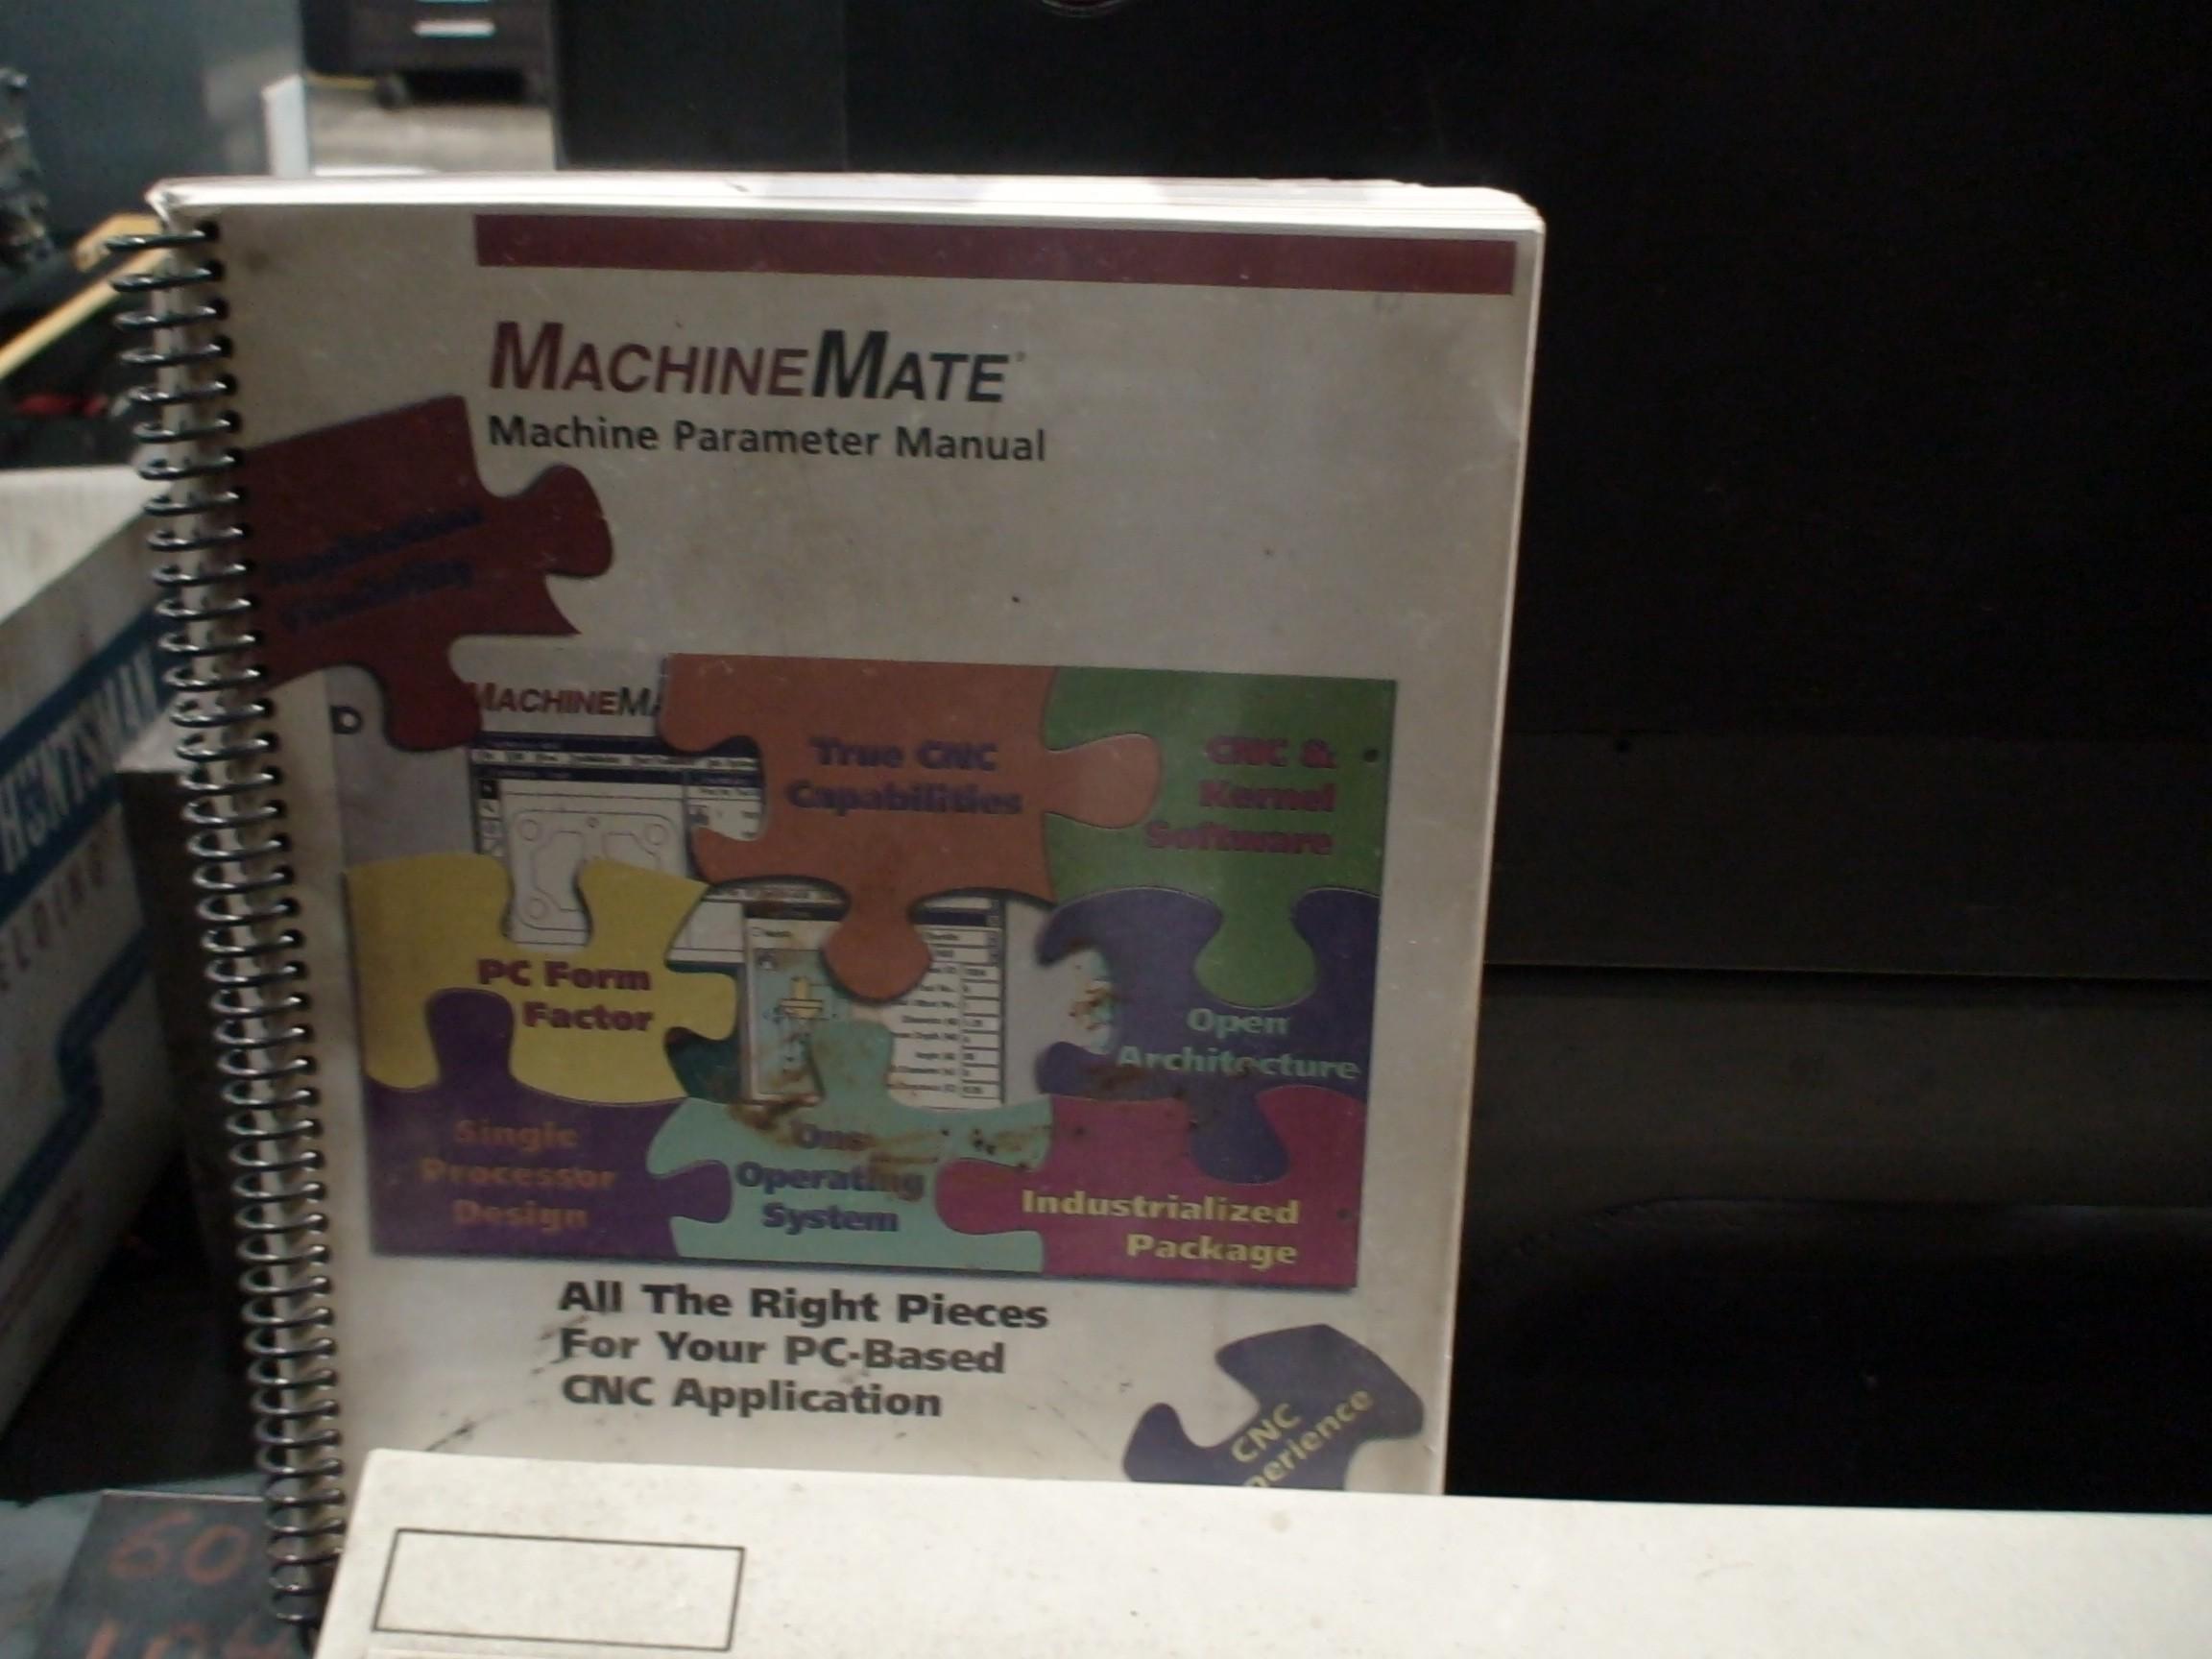 http://www.machinetools247.com/images/machines/12605-Mori-Seiki DLL-1500 d.jpg